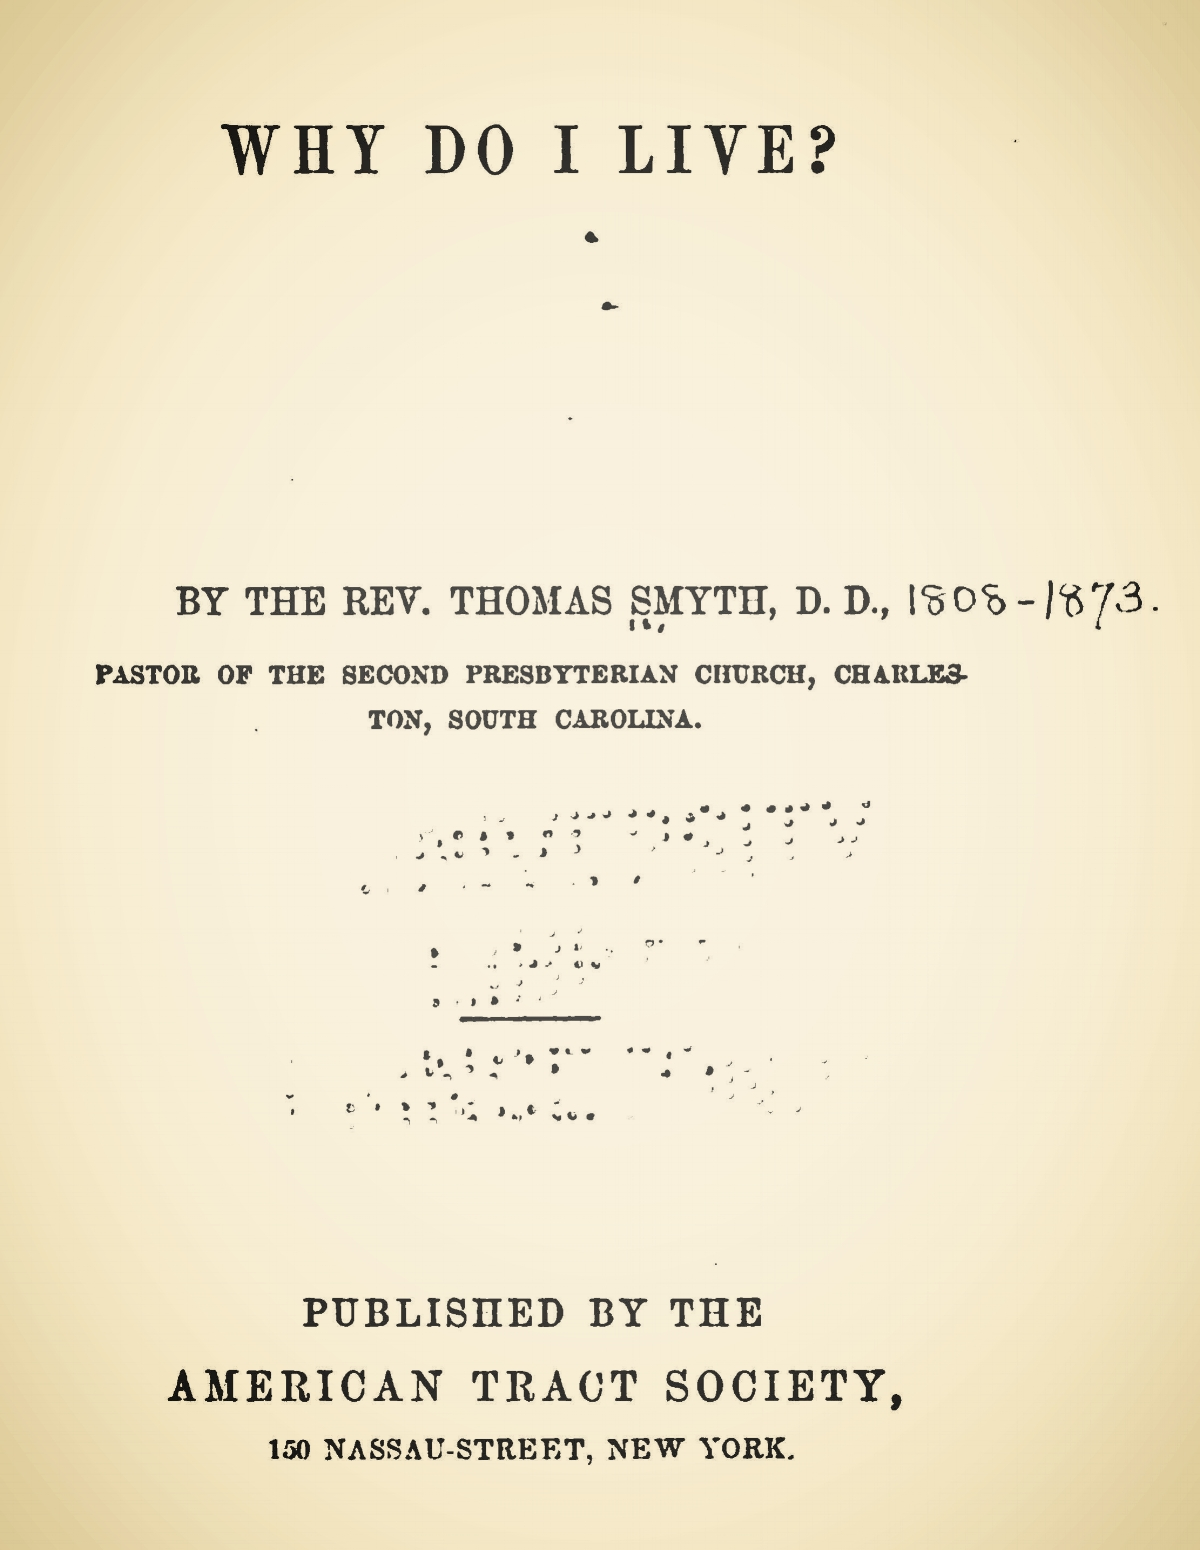 Smyth, Thomas, Why Do I Live Title Page.jpg